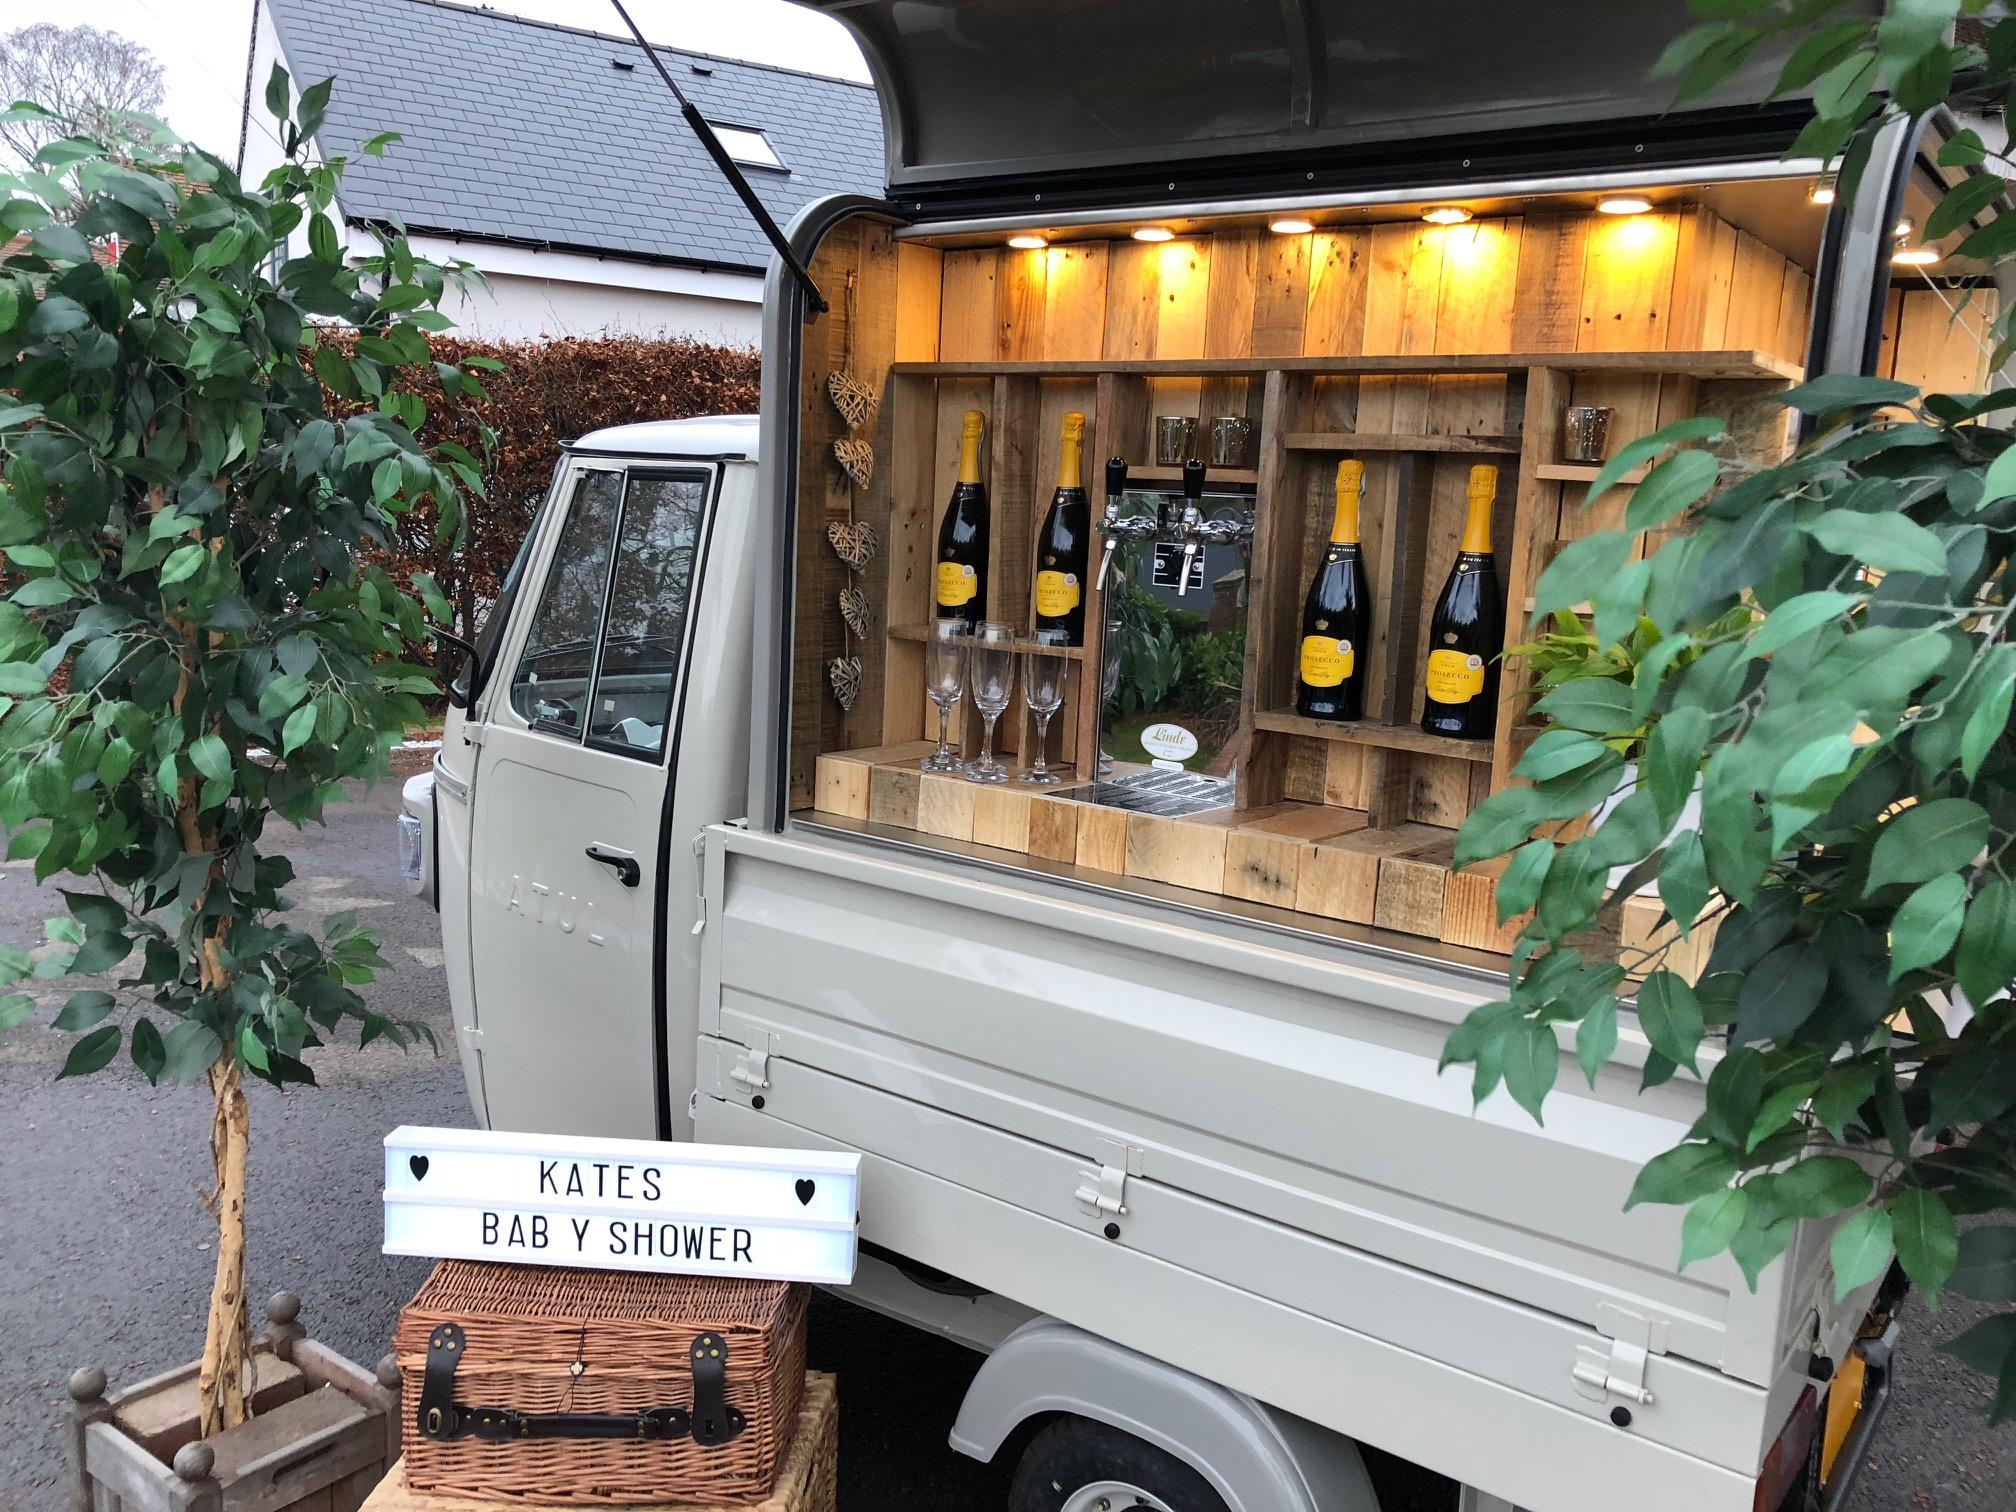 Kates Baby Shower | Mobile Bar UK